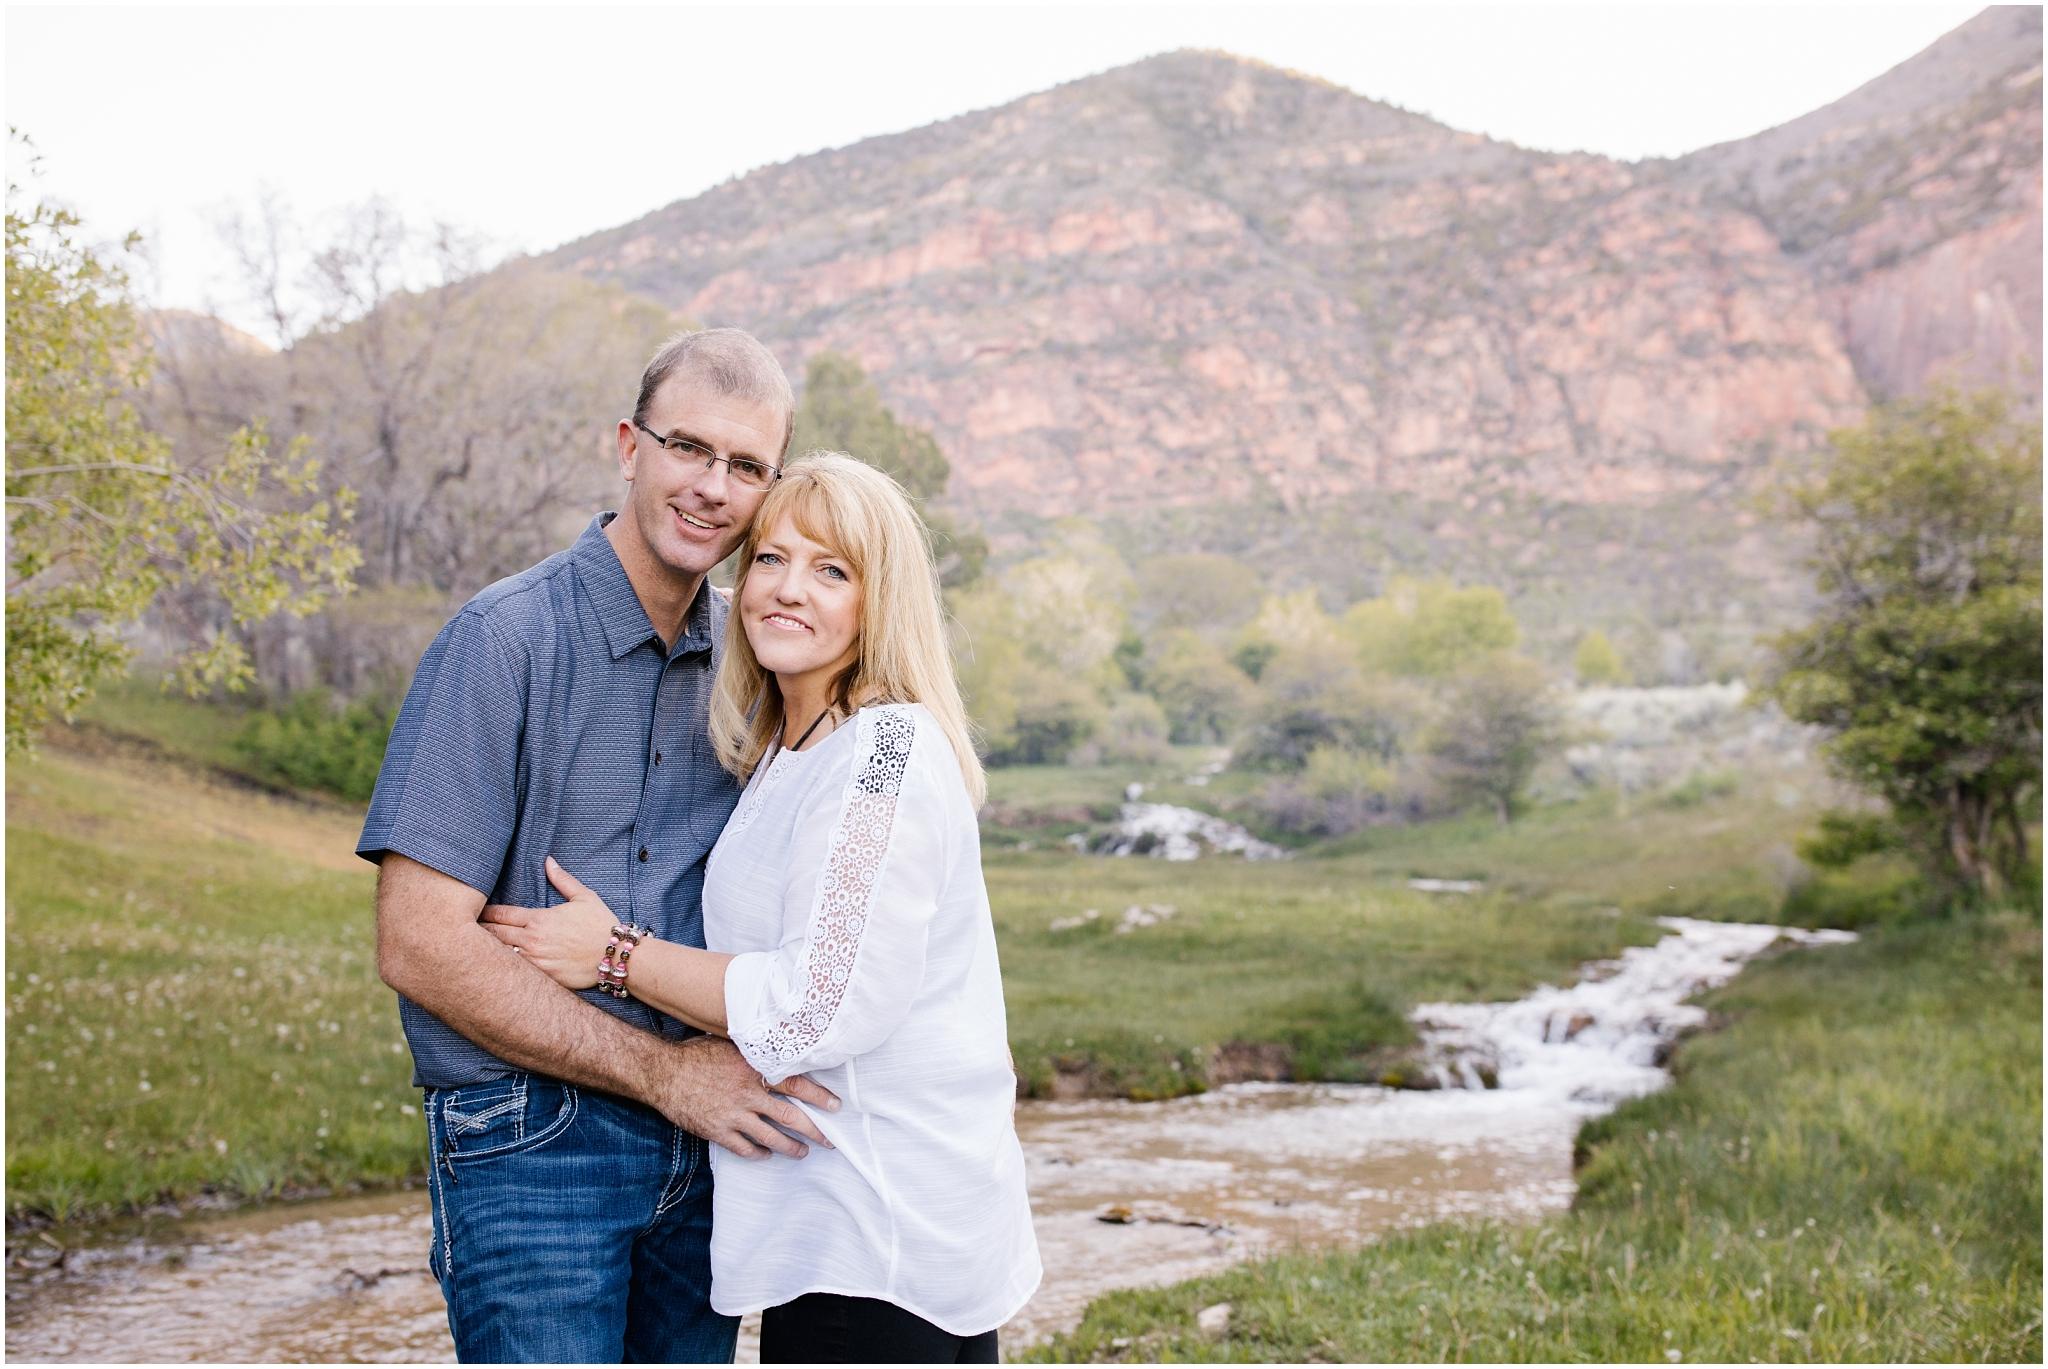 Bagley-145_Lizzie-B-Imagery-Utah-Family-Photographer-Central-Utah-Photographer-Utah-County-Extended-Family.jpg